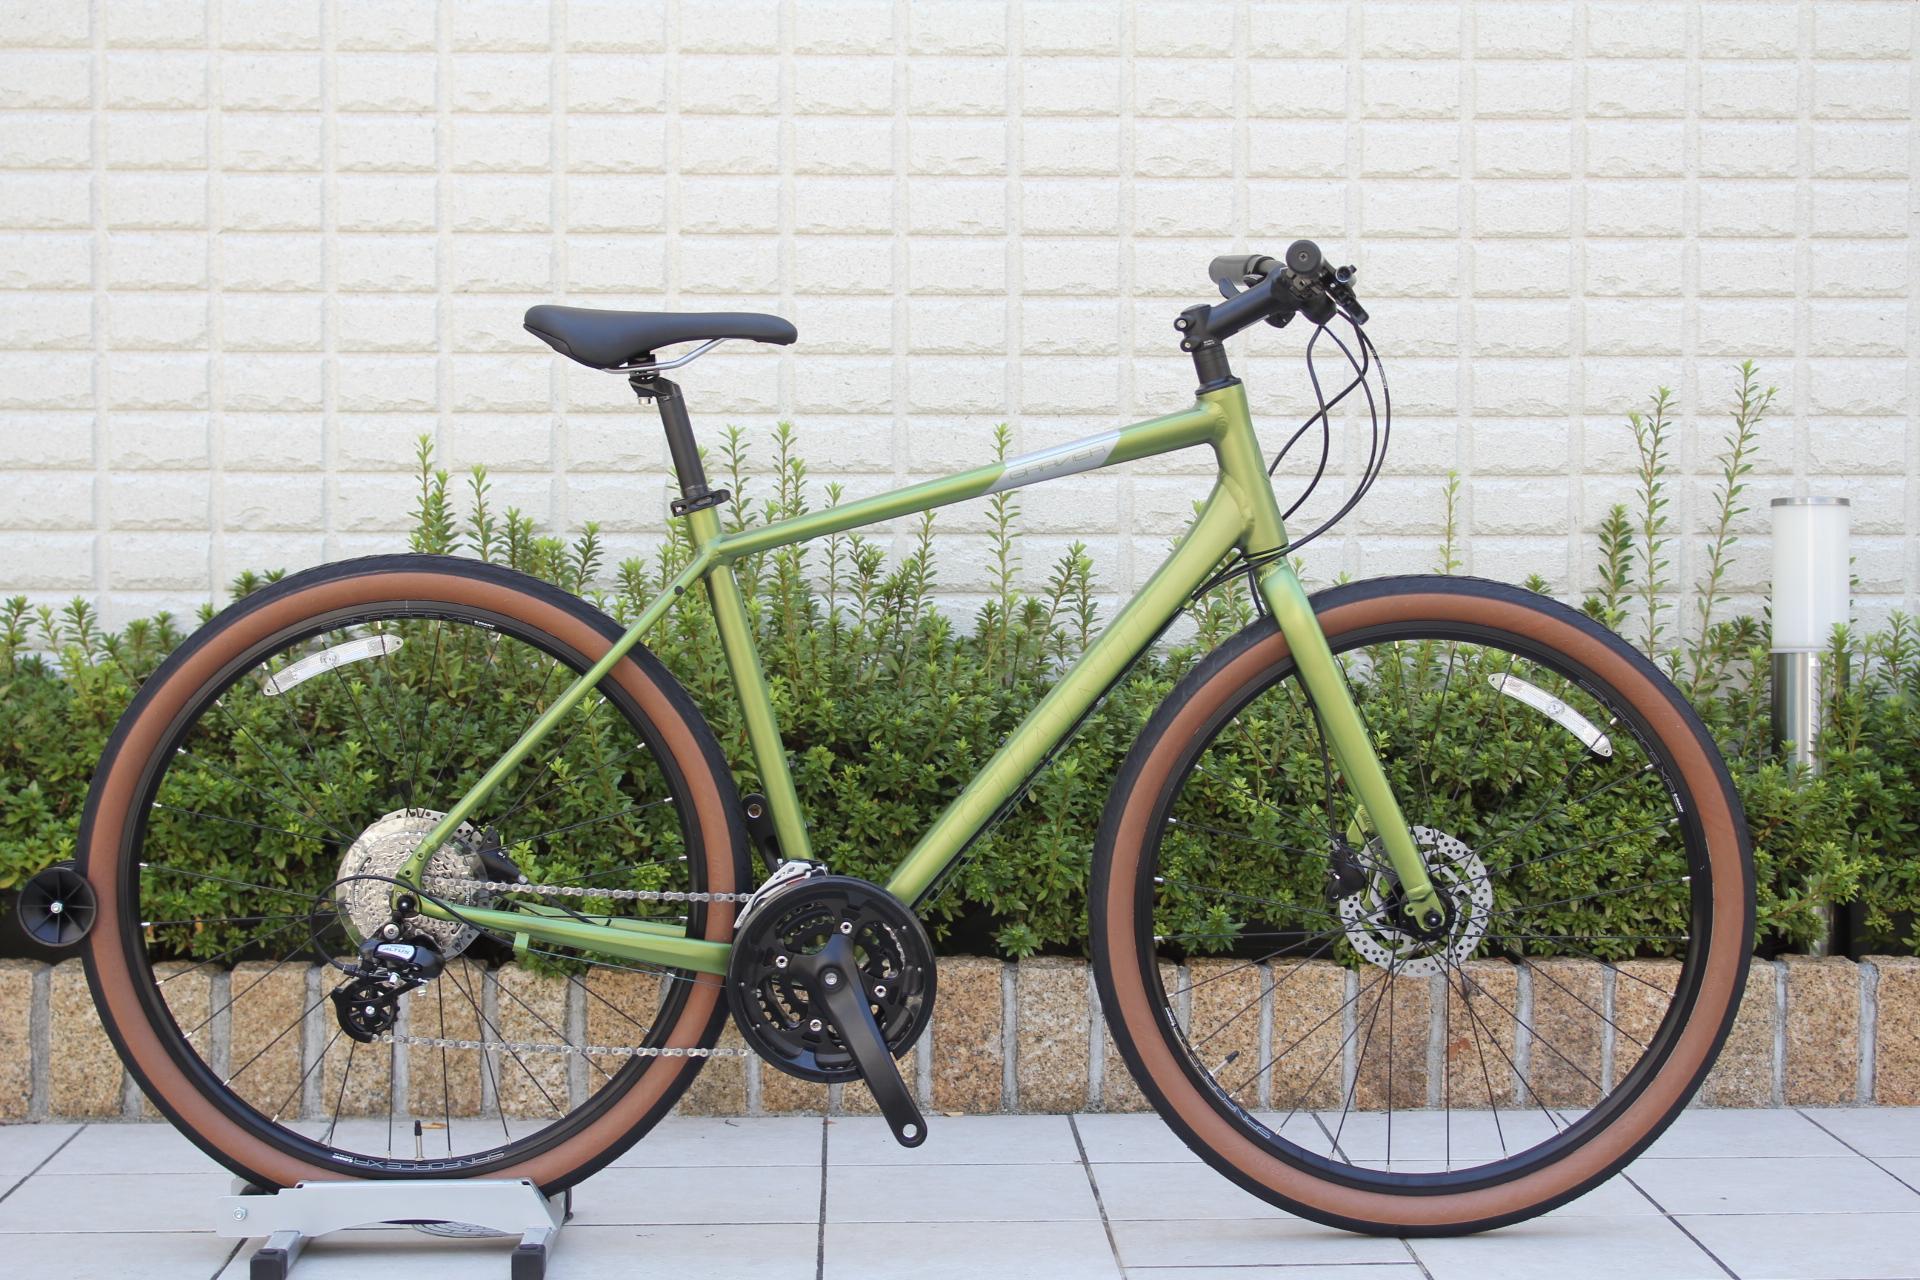 2020 GIANT『GRAVIER DISC』太いタイヤで凸凹道も安心MTB寄りクロスバイク